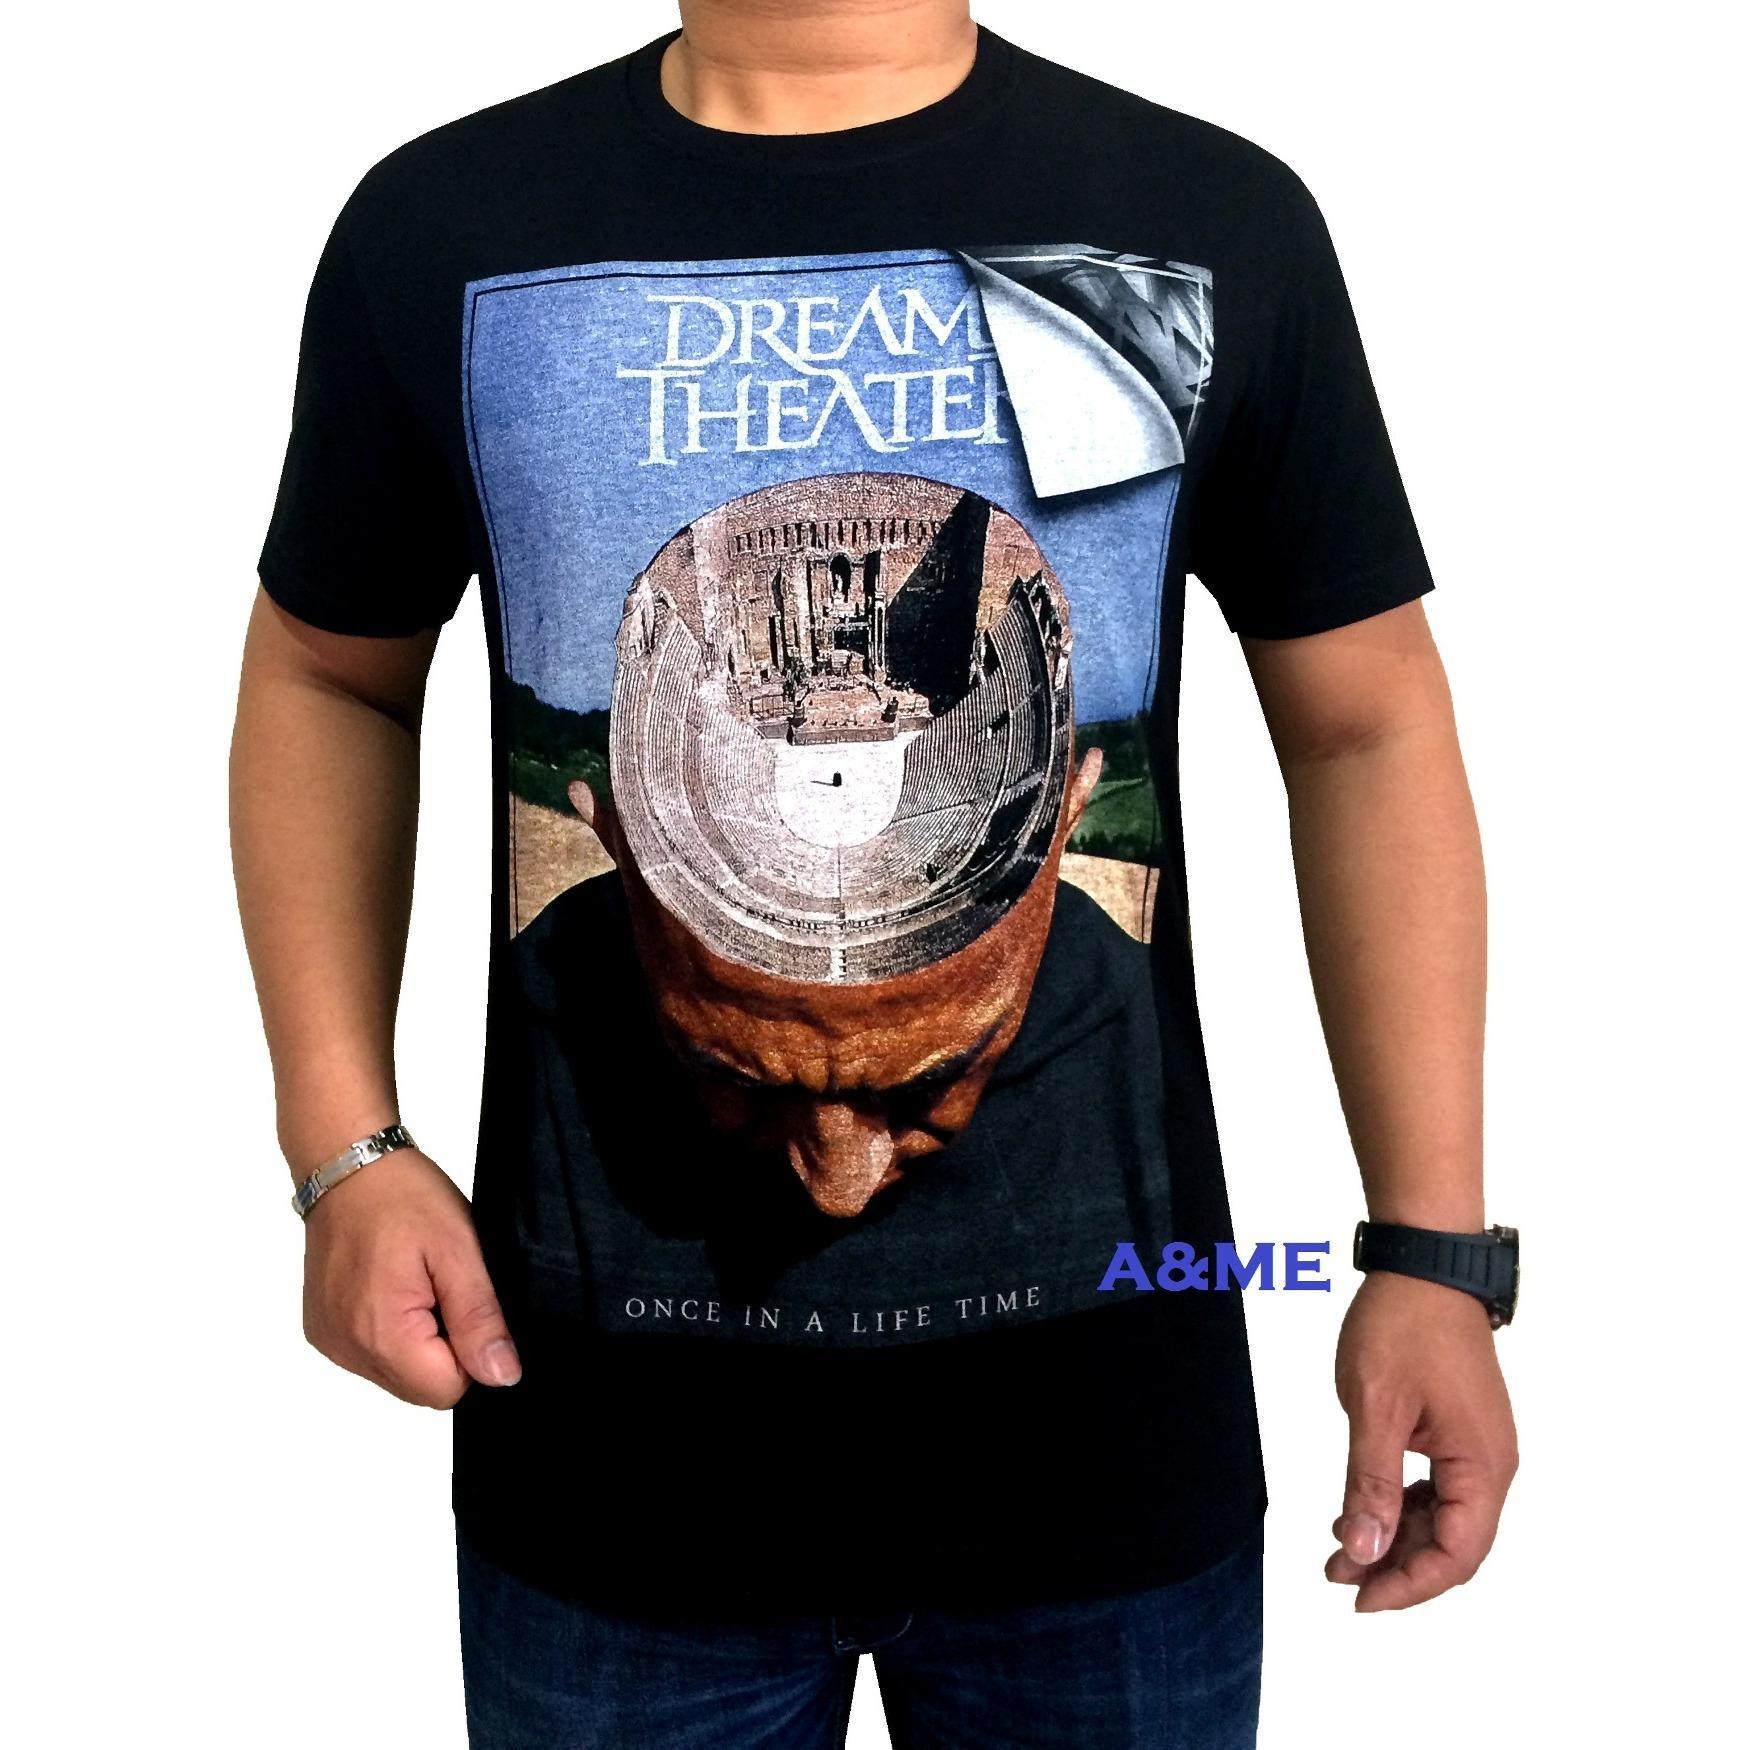 A&ME - Kaos Distro T-Shirt Distro Pria Fashion 100% Cotton Combed 30s Atasan Baju Pria Wanita Kaos Cowok Cewek T-Shirt 3D Terbaru Kekinian Animasi Seni Kata Gambar Sablonan Dream Theater Wajah Pakaian Bagus Moderen Modis Casual Keren Kaos Distro - Hitam